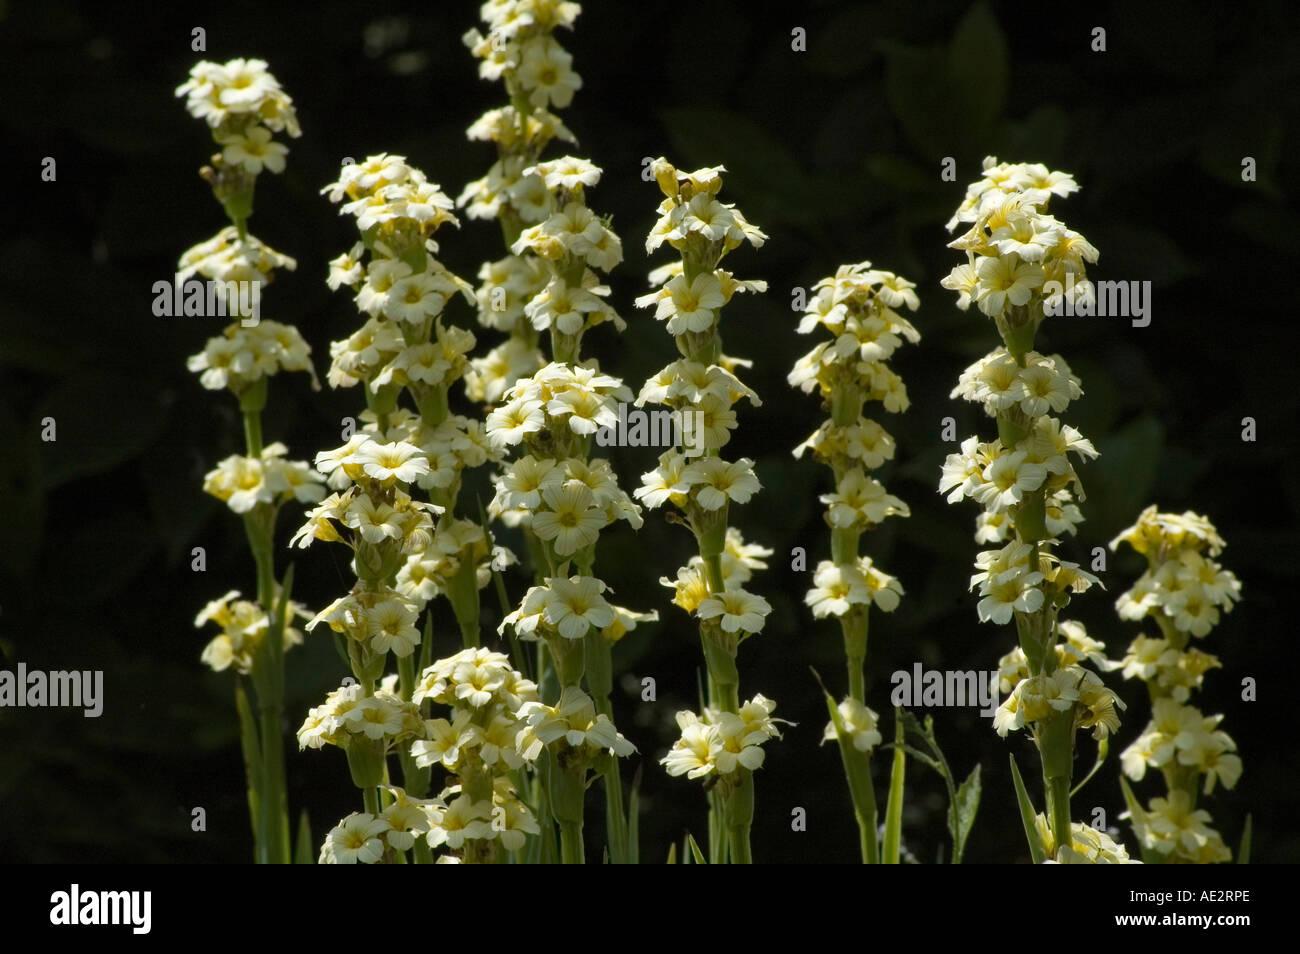 Sisyrinchium striatum garden border flowering perennial with cream sisyrinchium striatum garden border flowering perennial with cream flowers in summer mightylinksfo